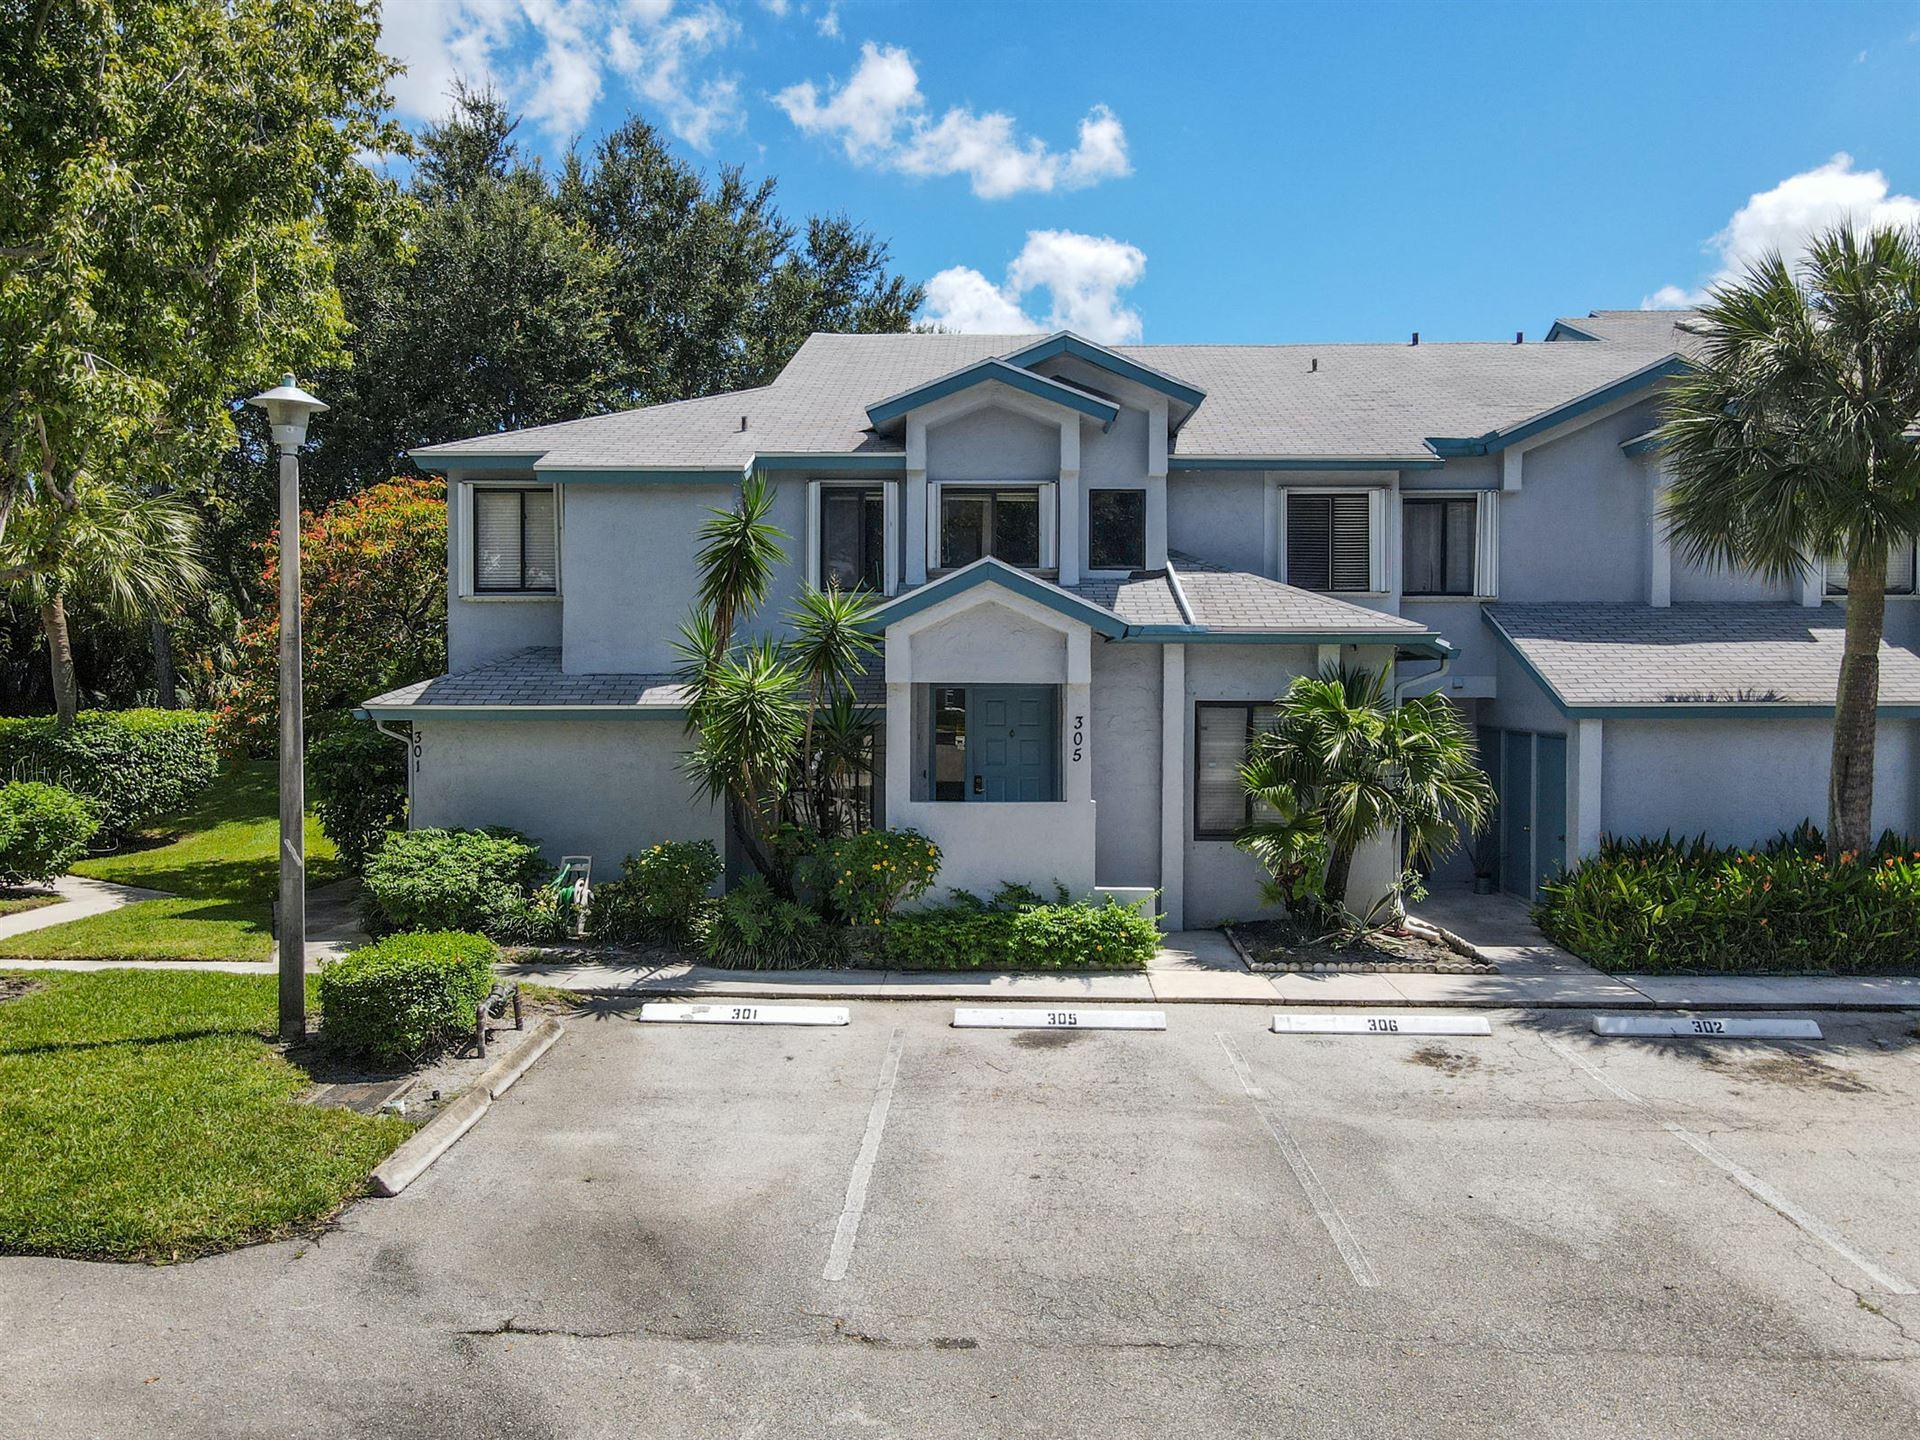 Photo of 305 Harbour Pointe Way, Greenacres, FL 33413 (MLS # RX-10650107)